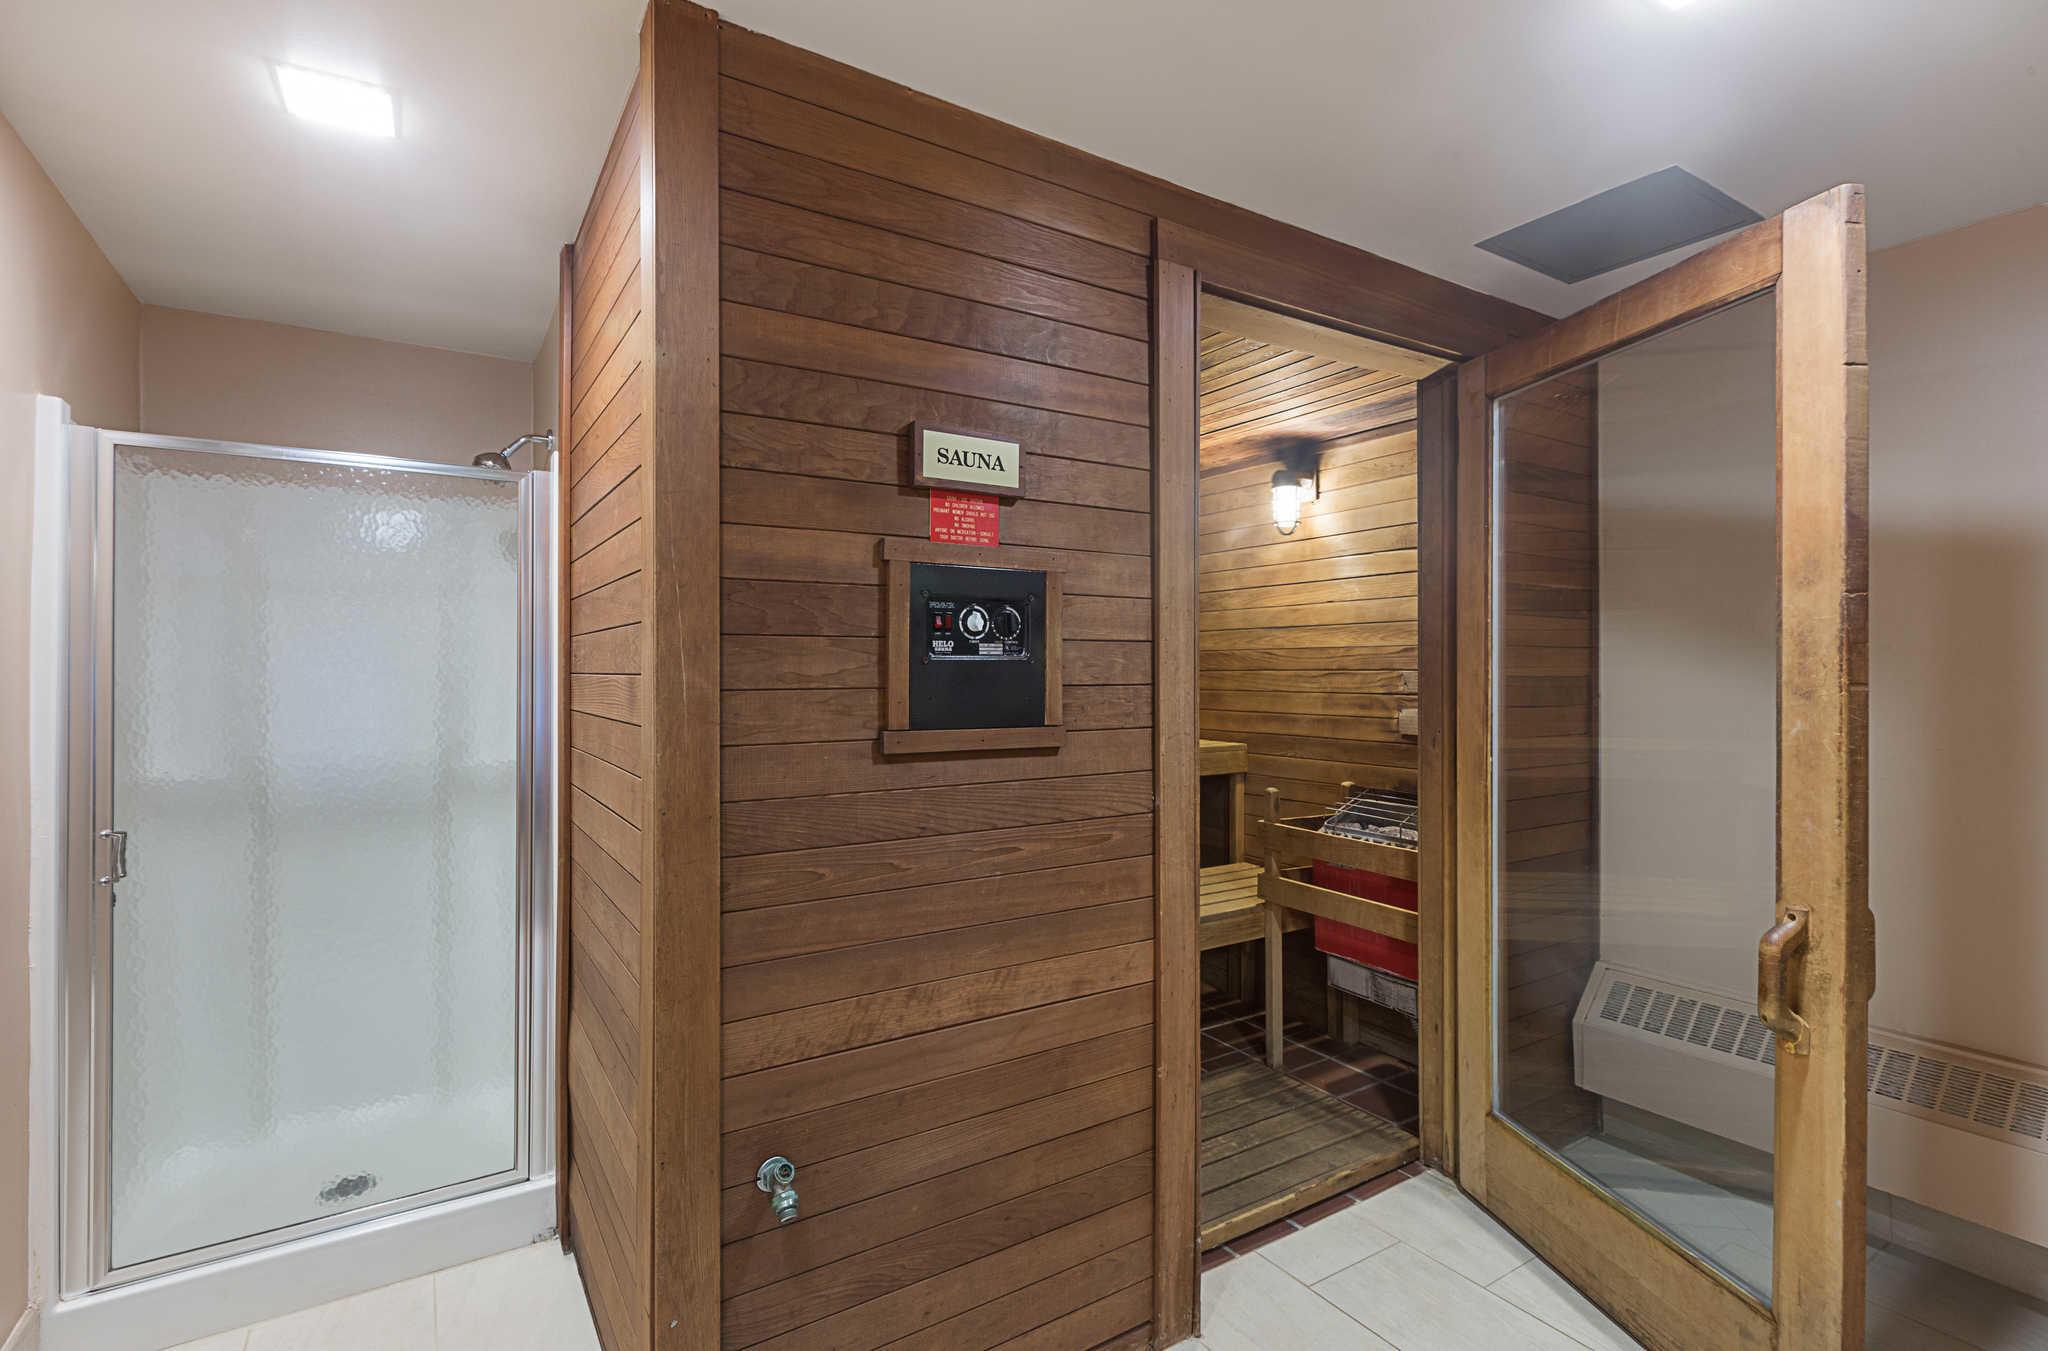 Quality Suites image 34